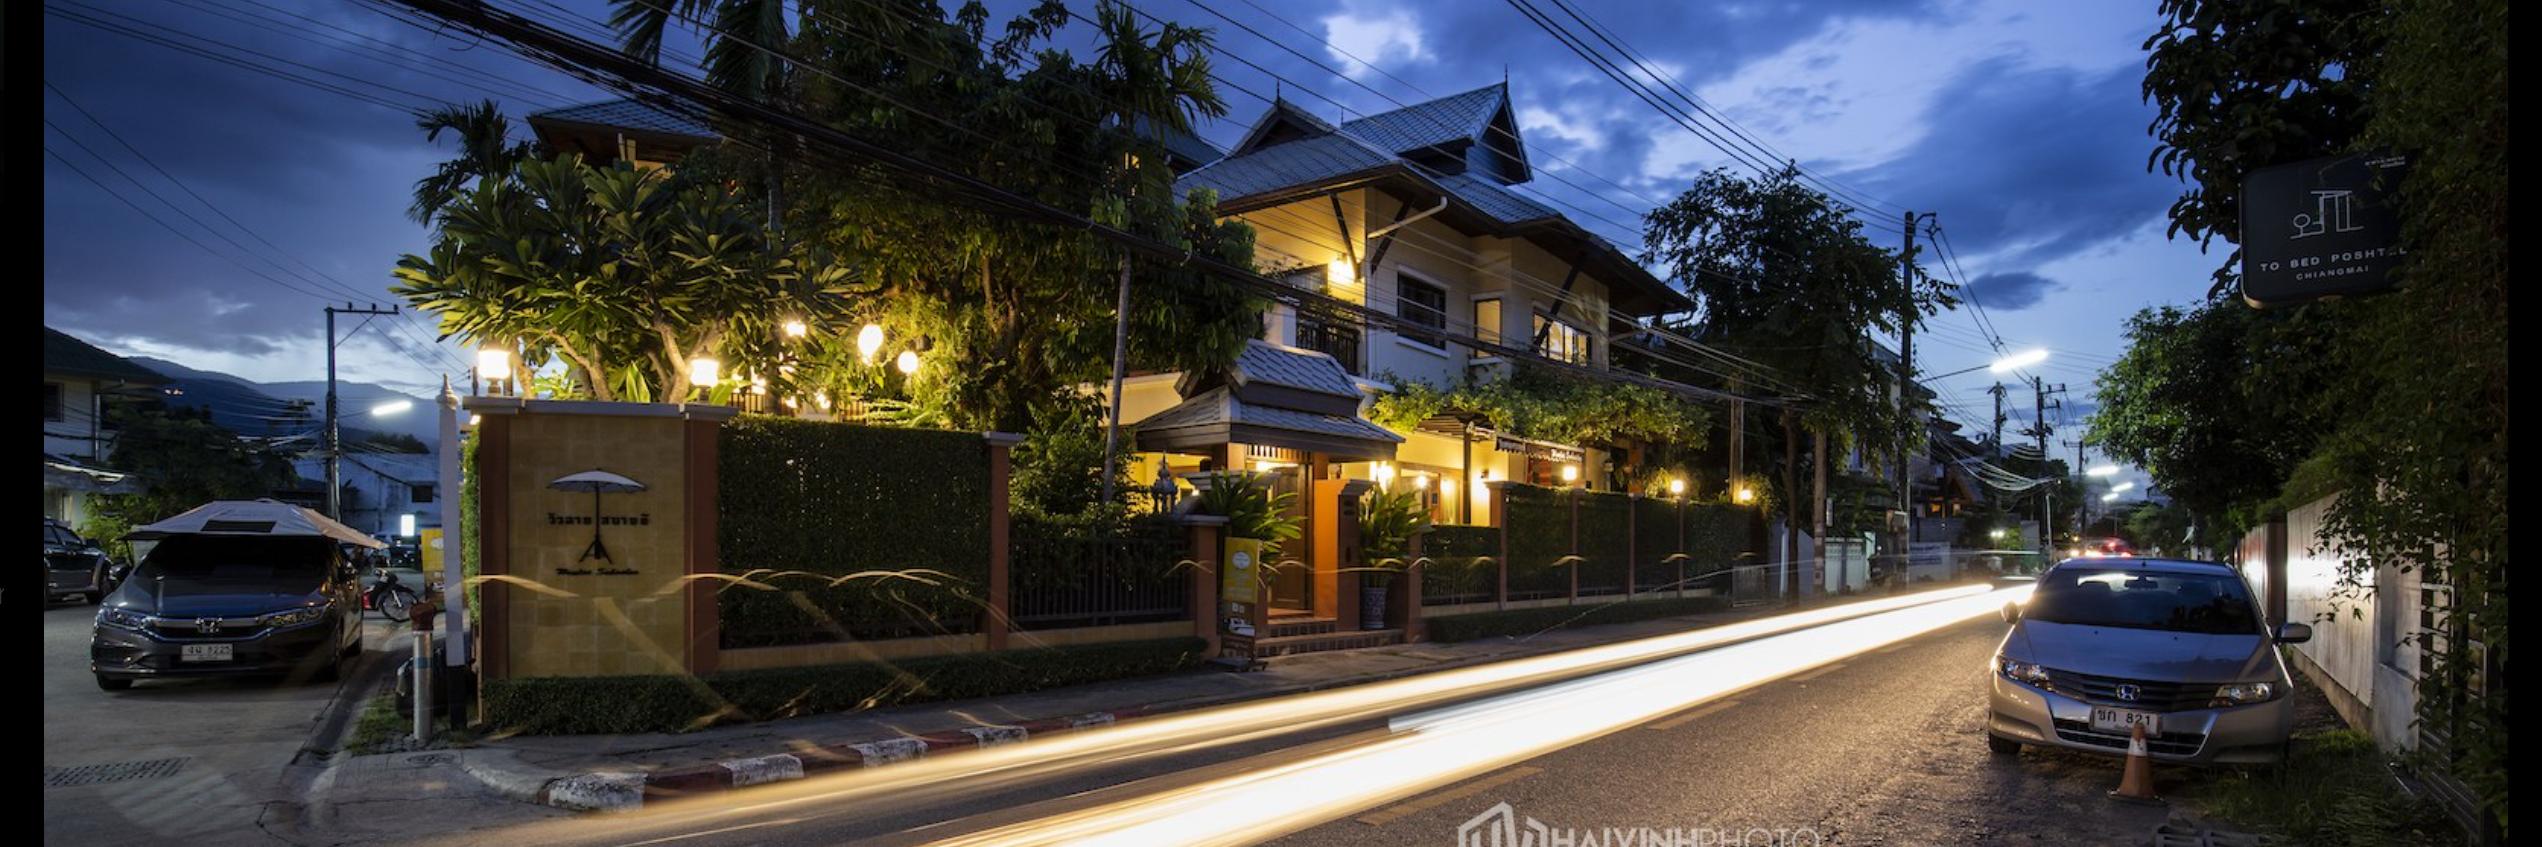 https://gody.vn/blog/haivinhphoto3927/post/review-wualai-sabaidee-boutique-hotel-o-chiang-mai-thai-lan-5624